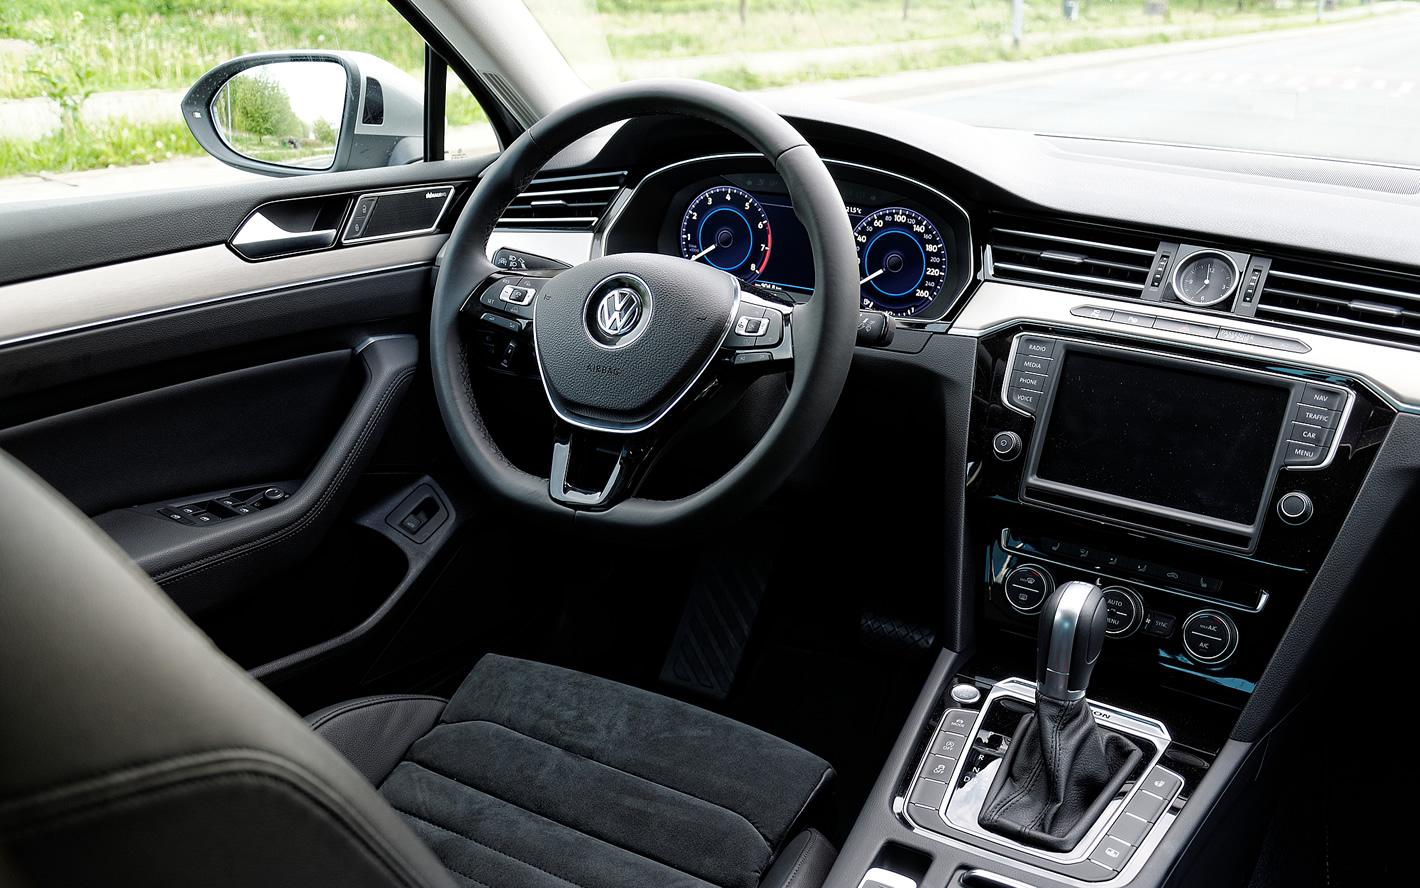 Kokpit w Volkswagen Passat 2.0 TSI 4Motion